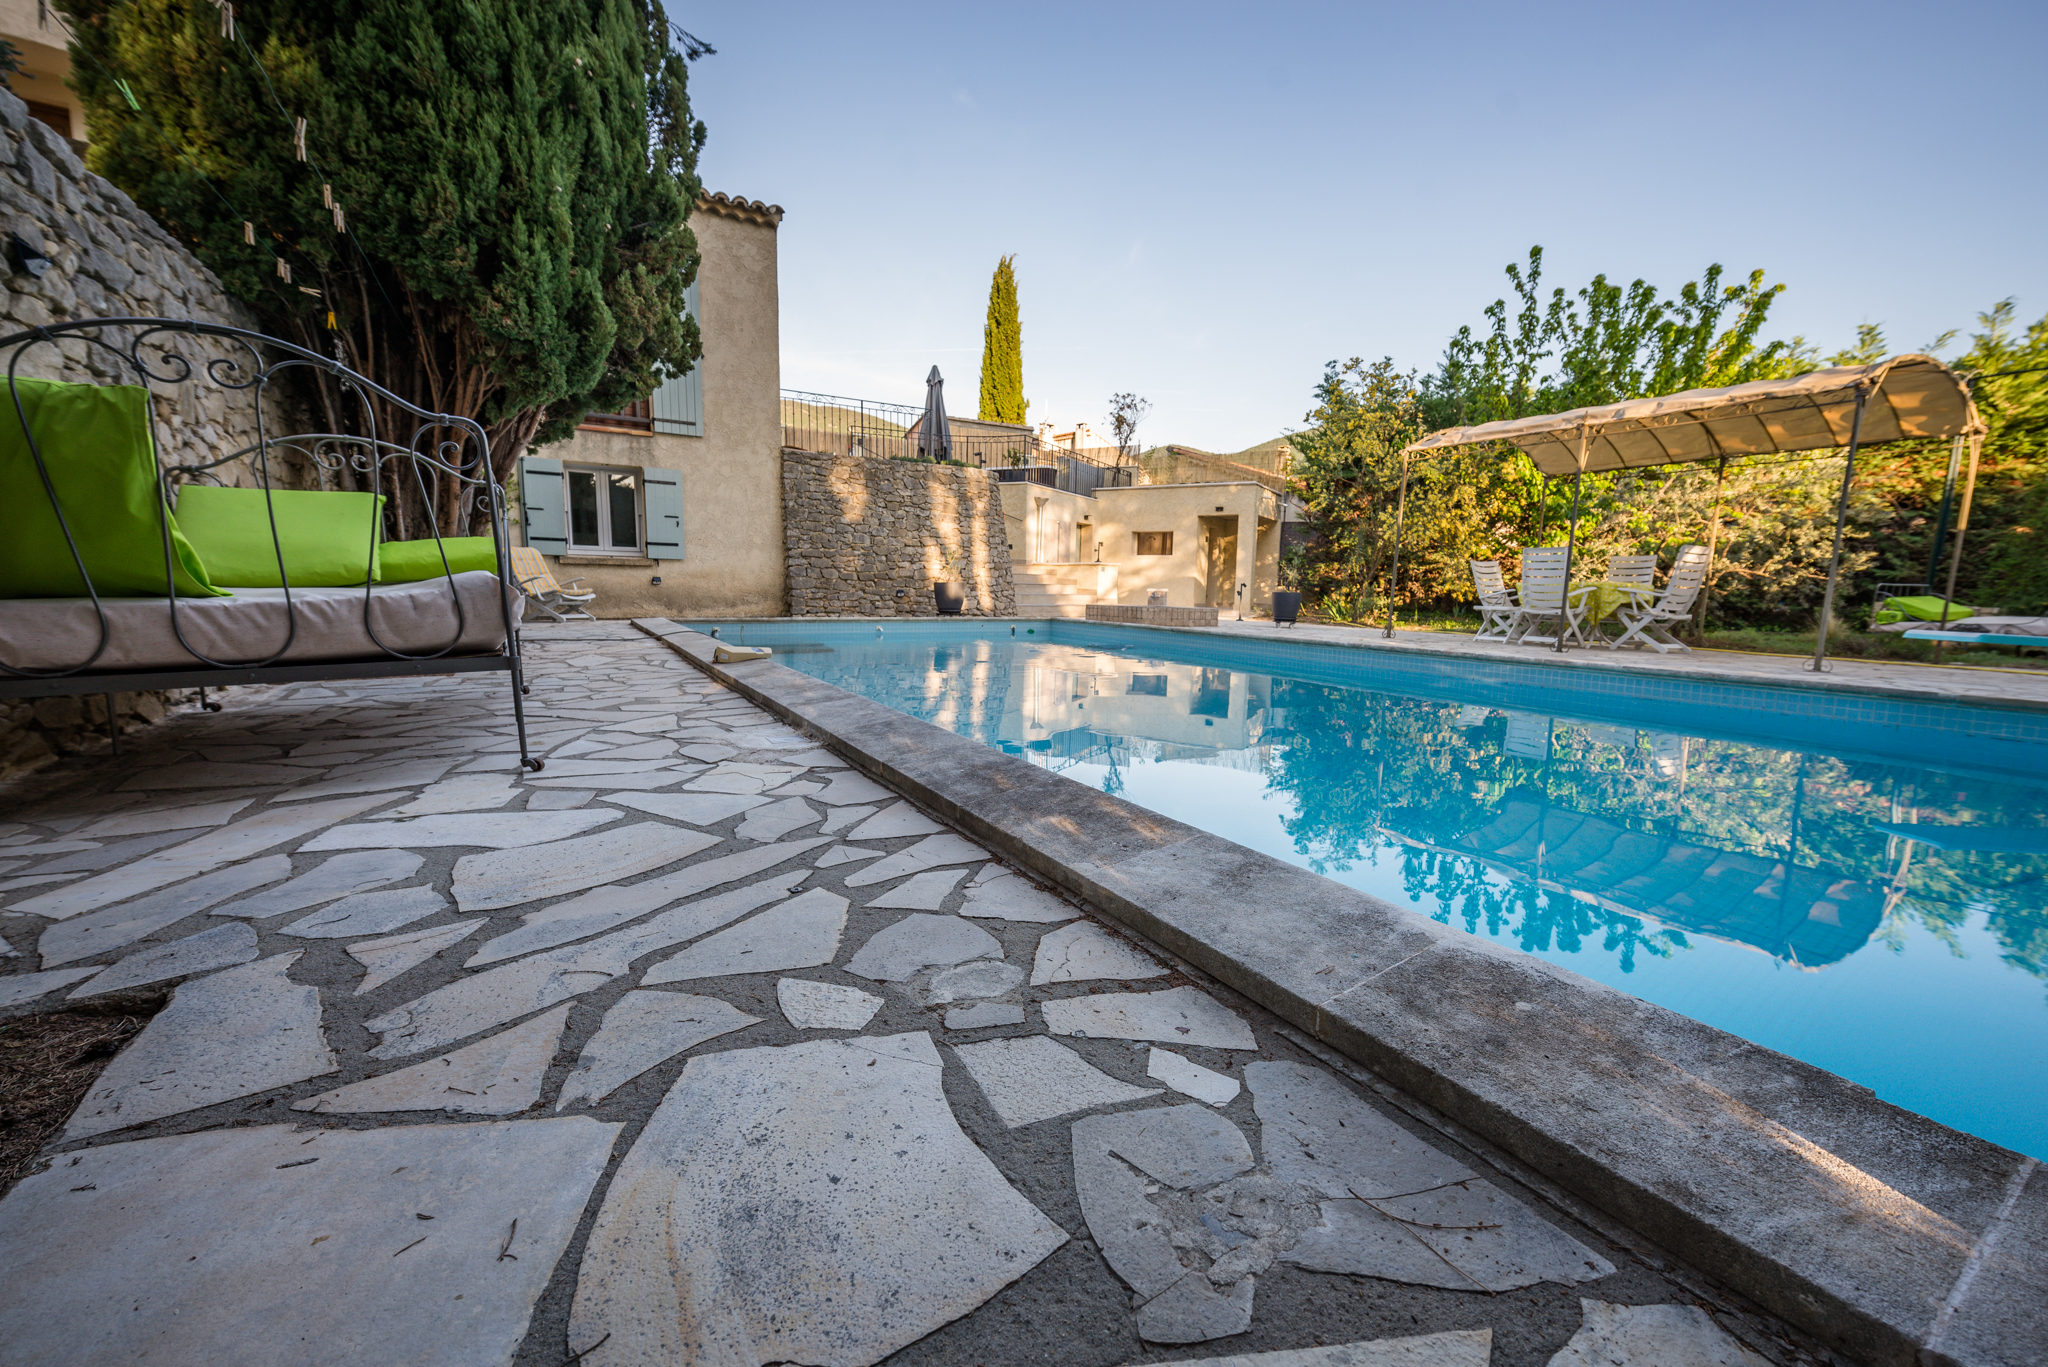 feriebolig-provence-privat-pool-DSC_4680.jpg